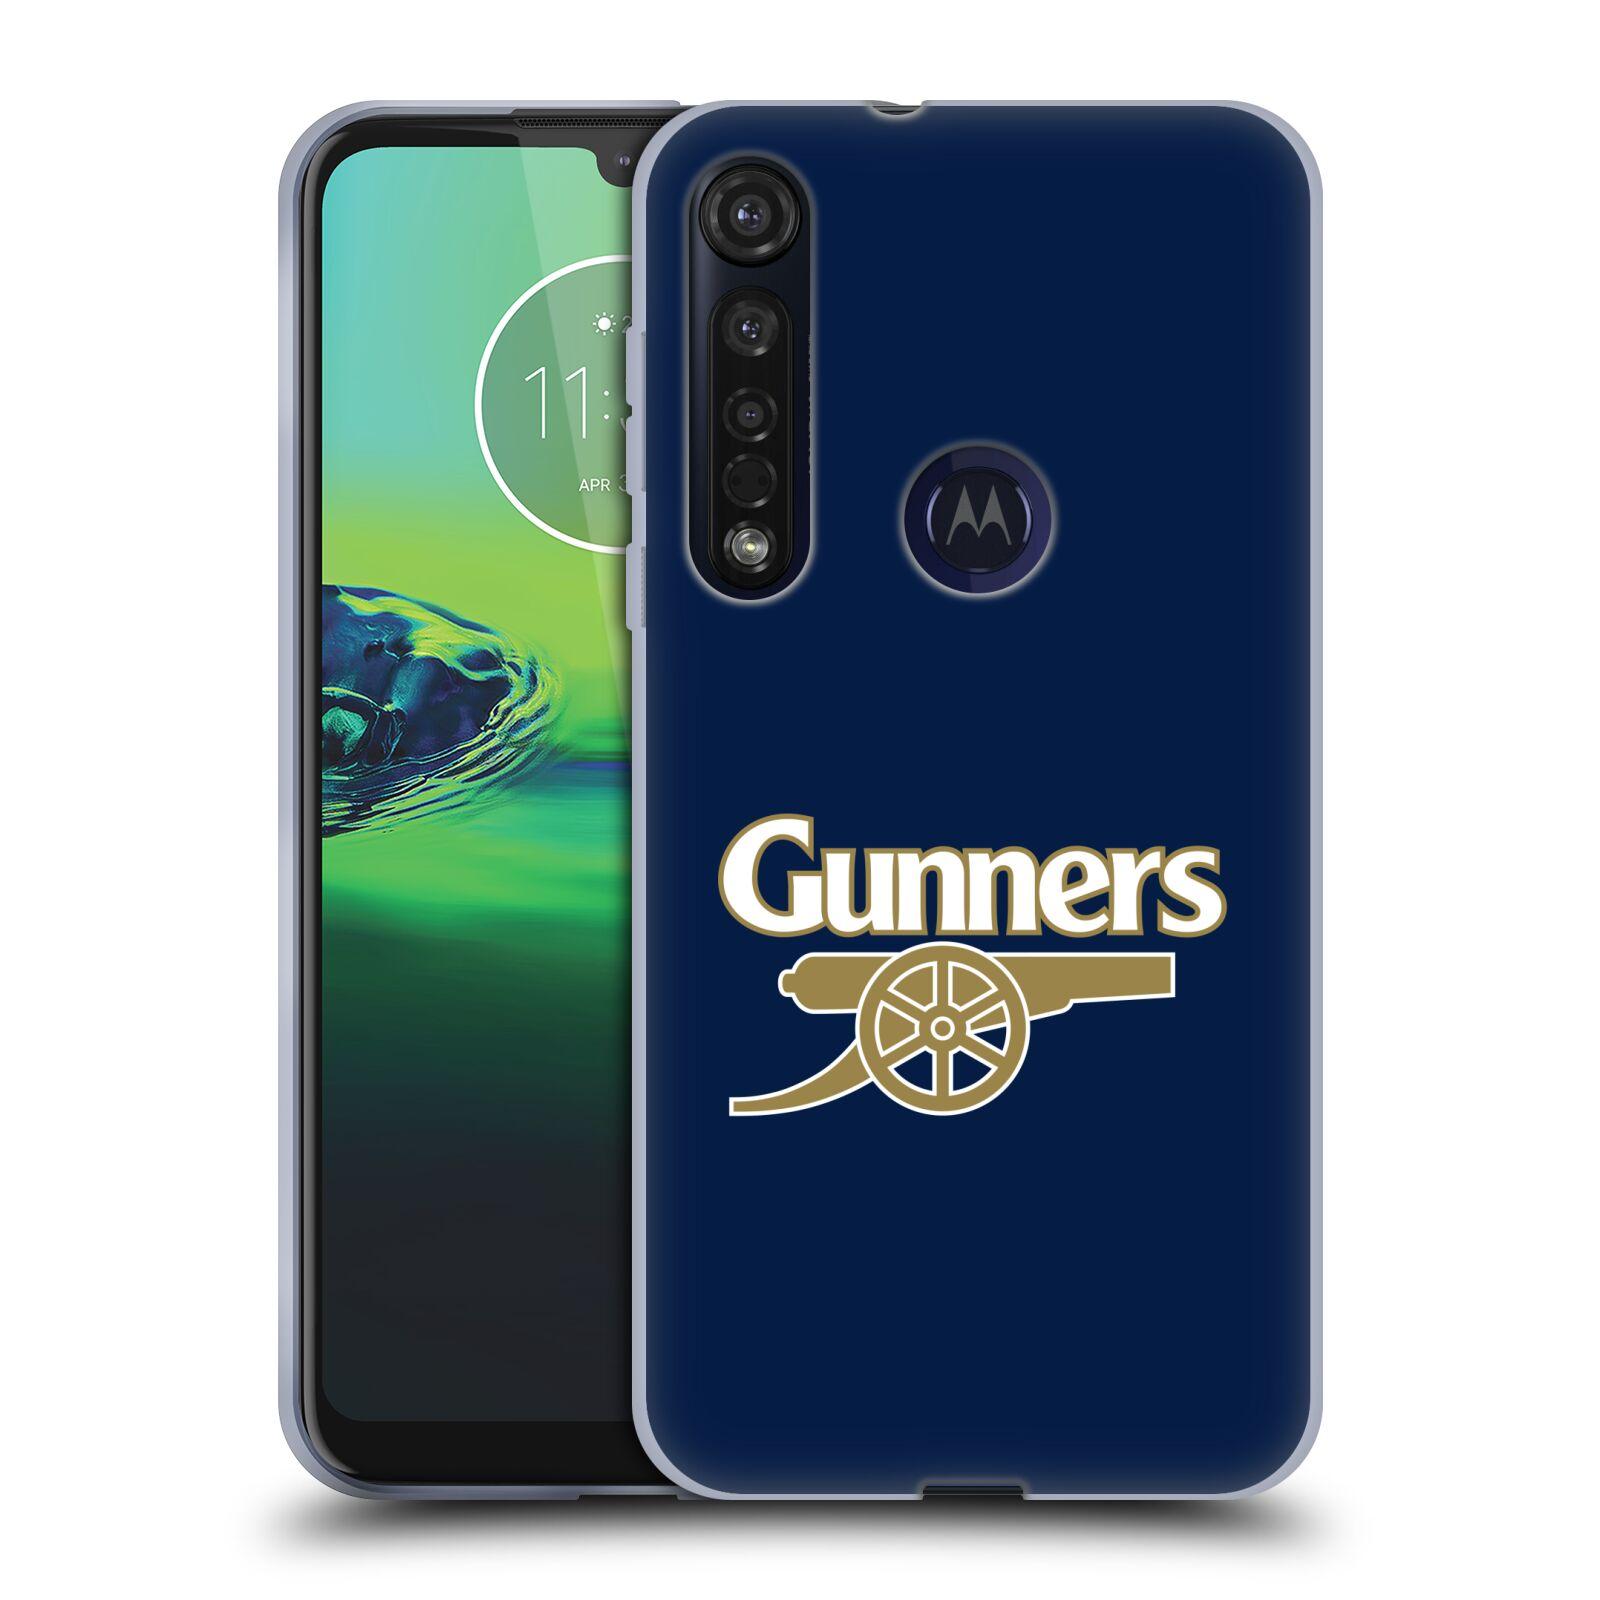 Silikonové pouzdro na mobil Motorola Moto G8 Plus - Head Case - Arsenal FC - Gunners